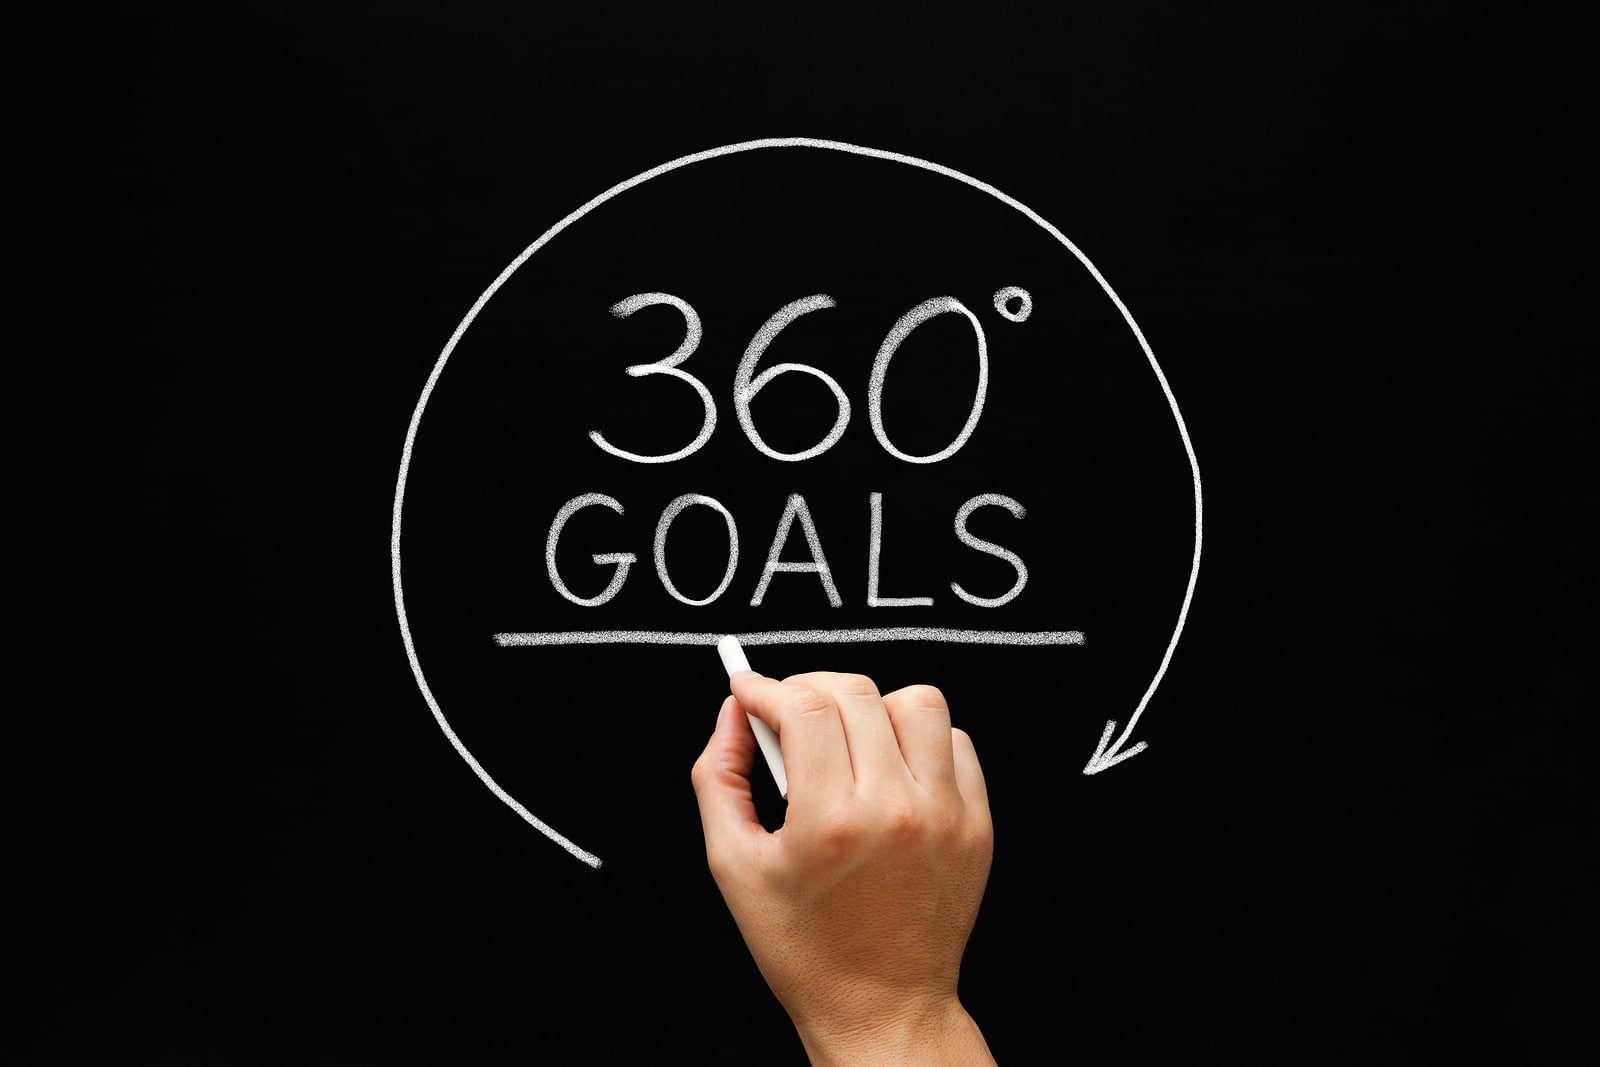 360 degree feedback software